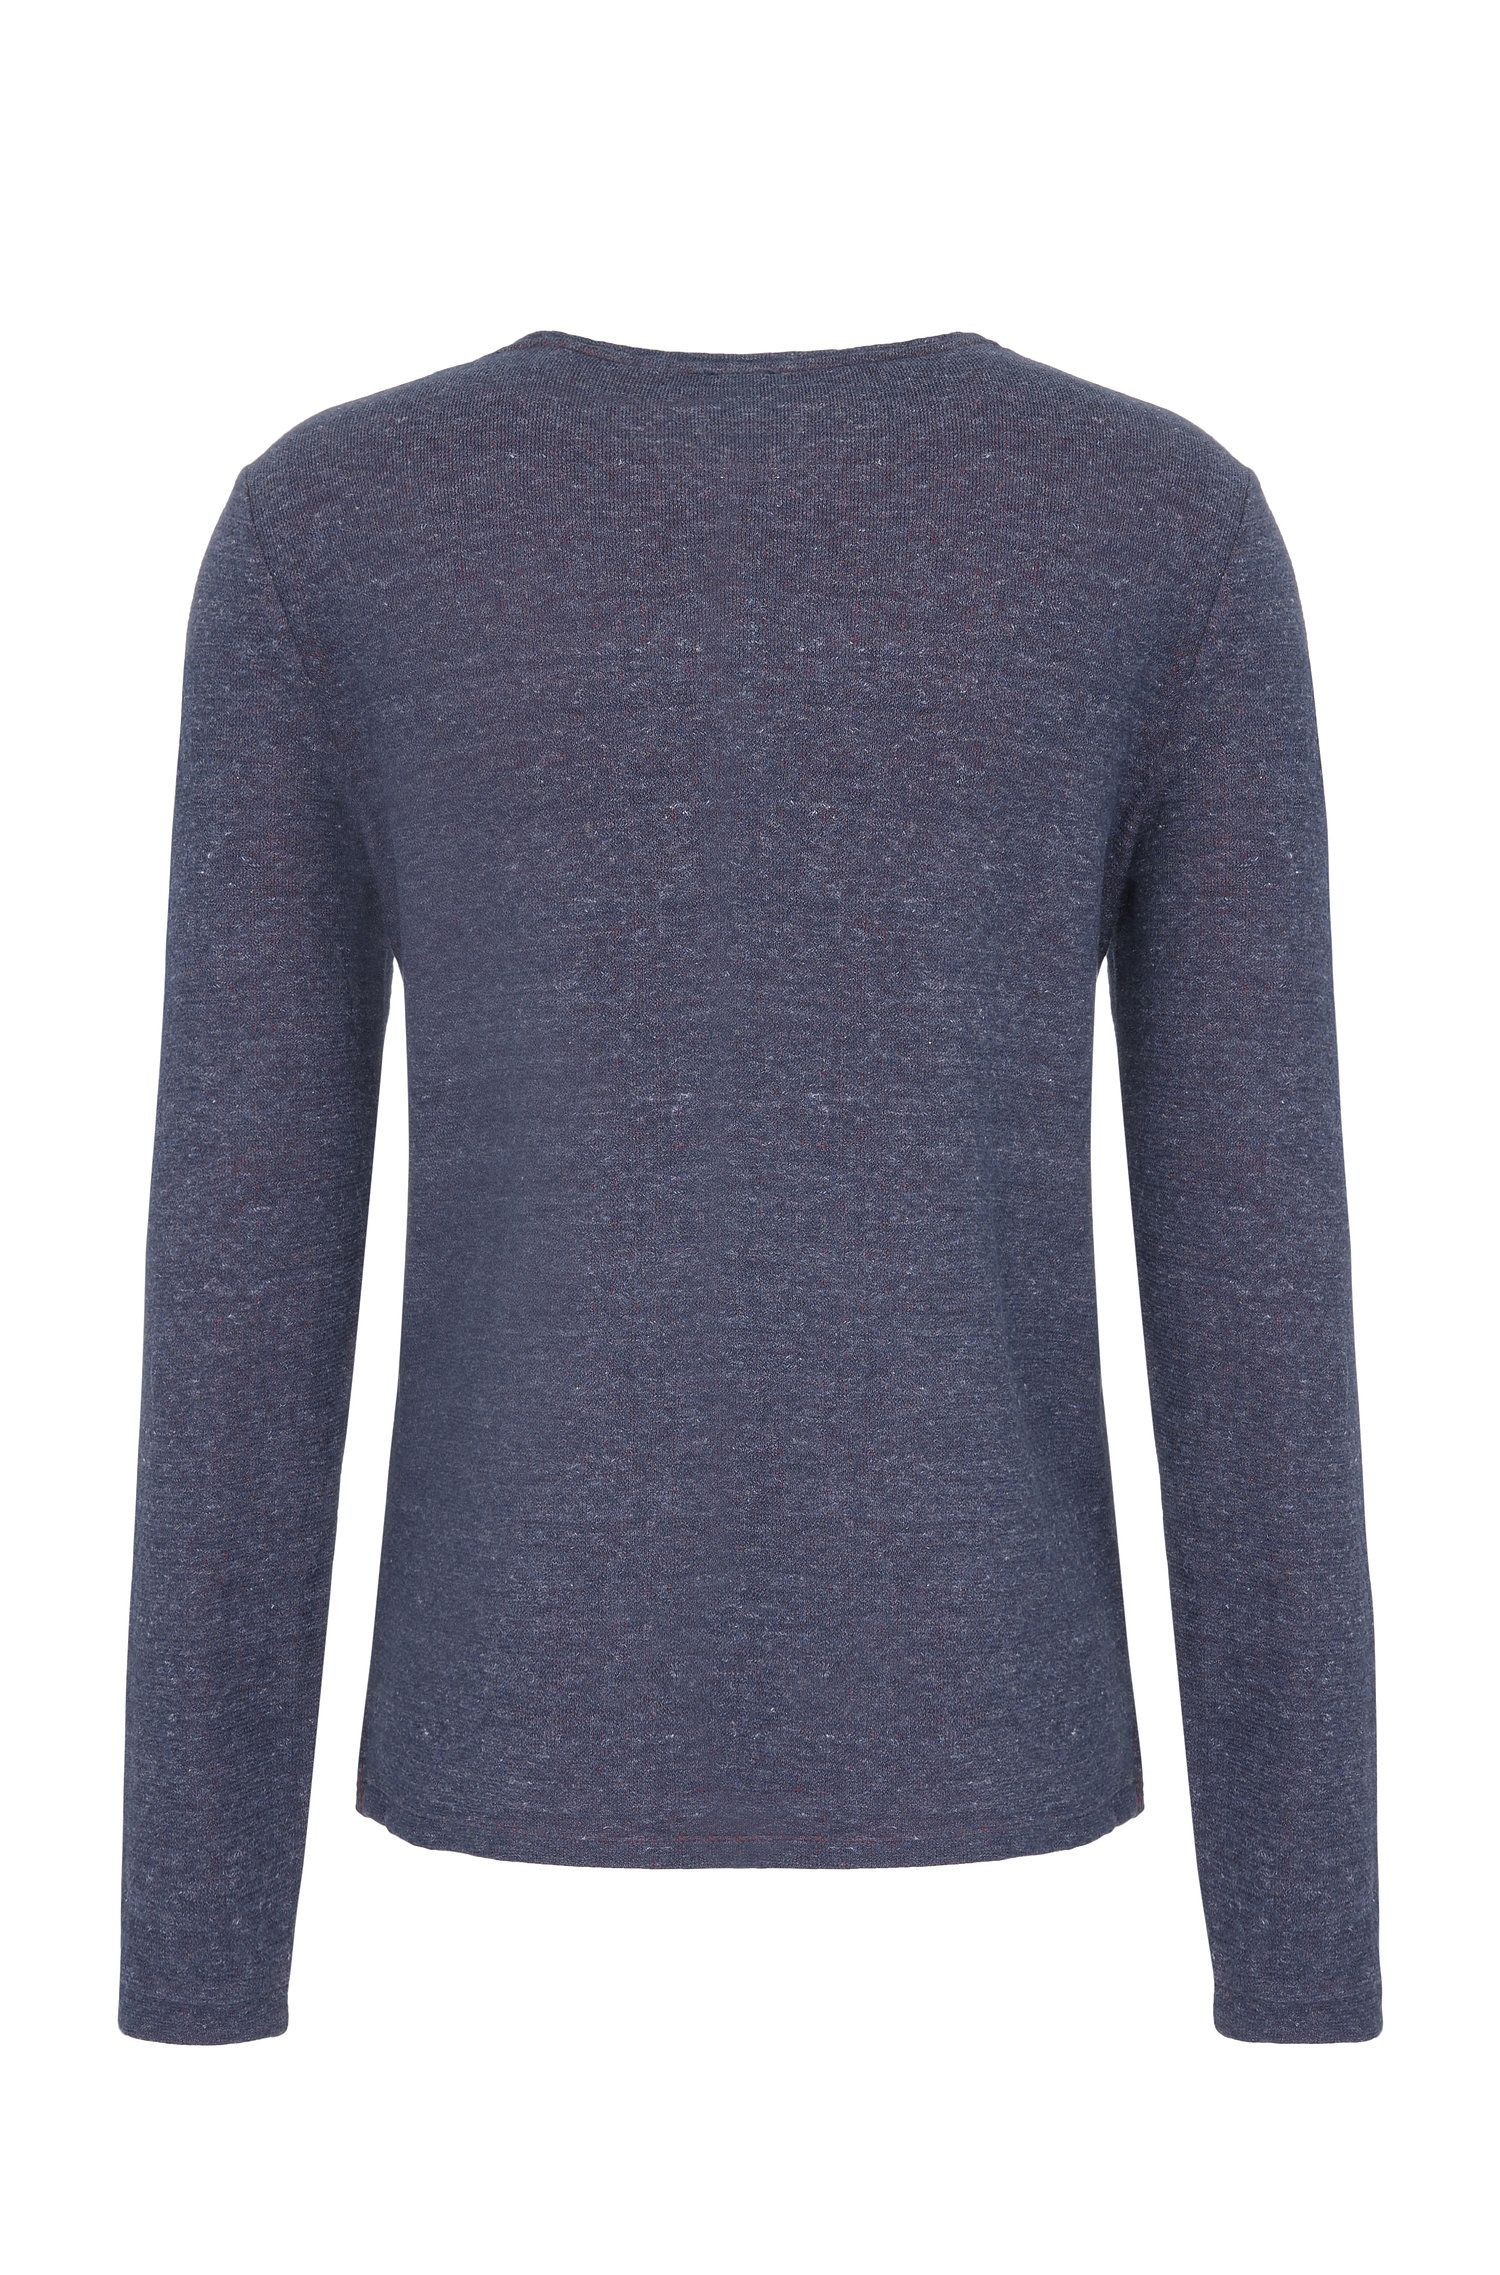 Cotton Melange Long Sleeve Shirt | Wanna